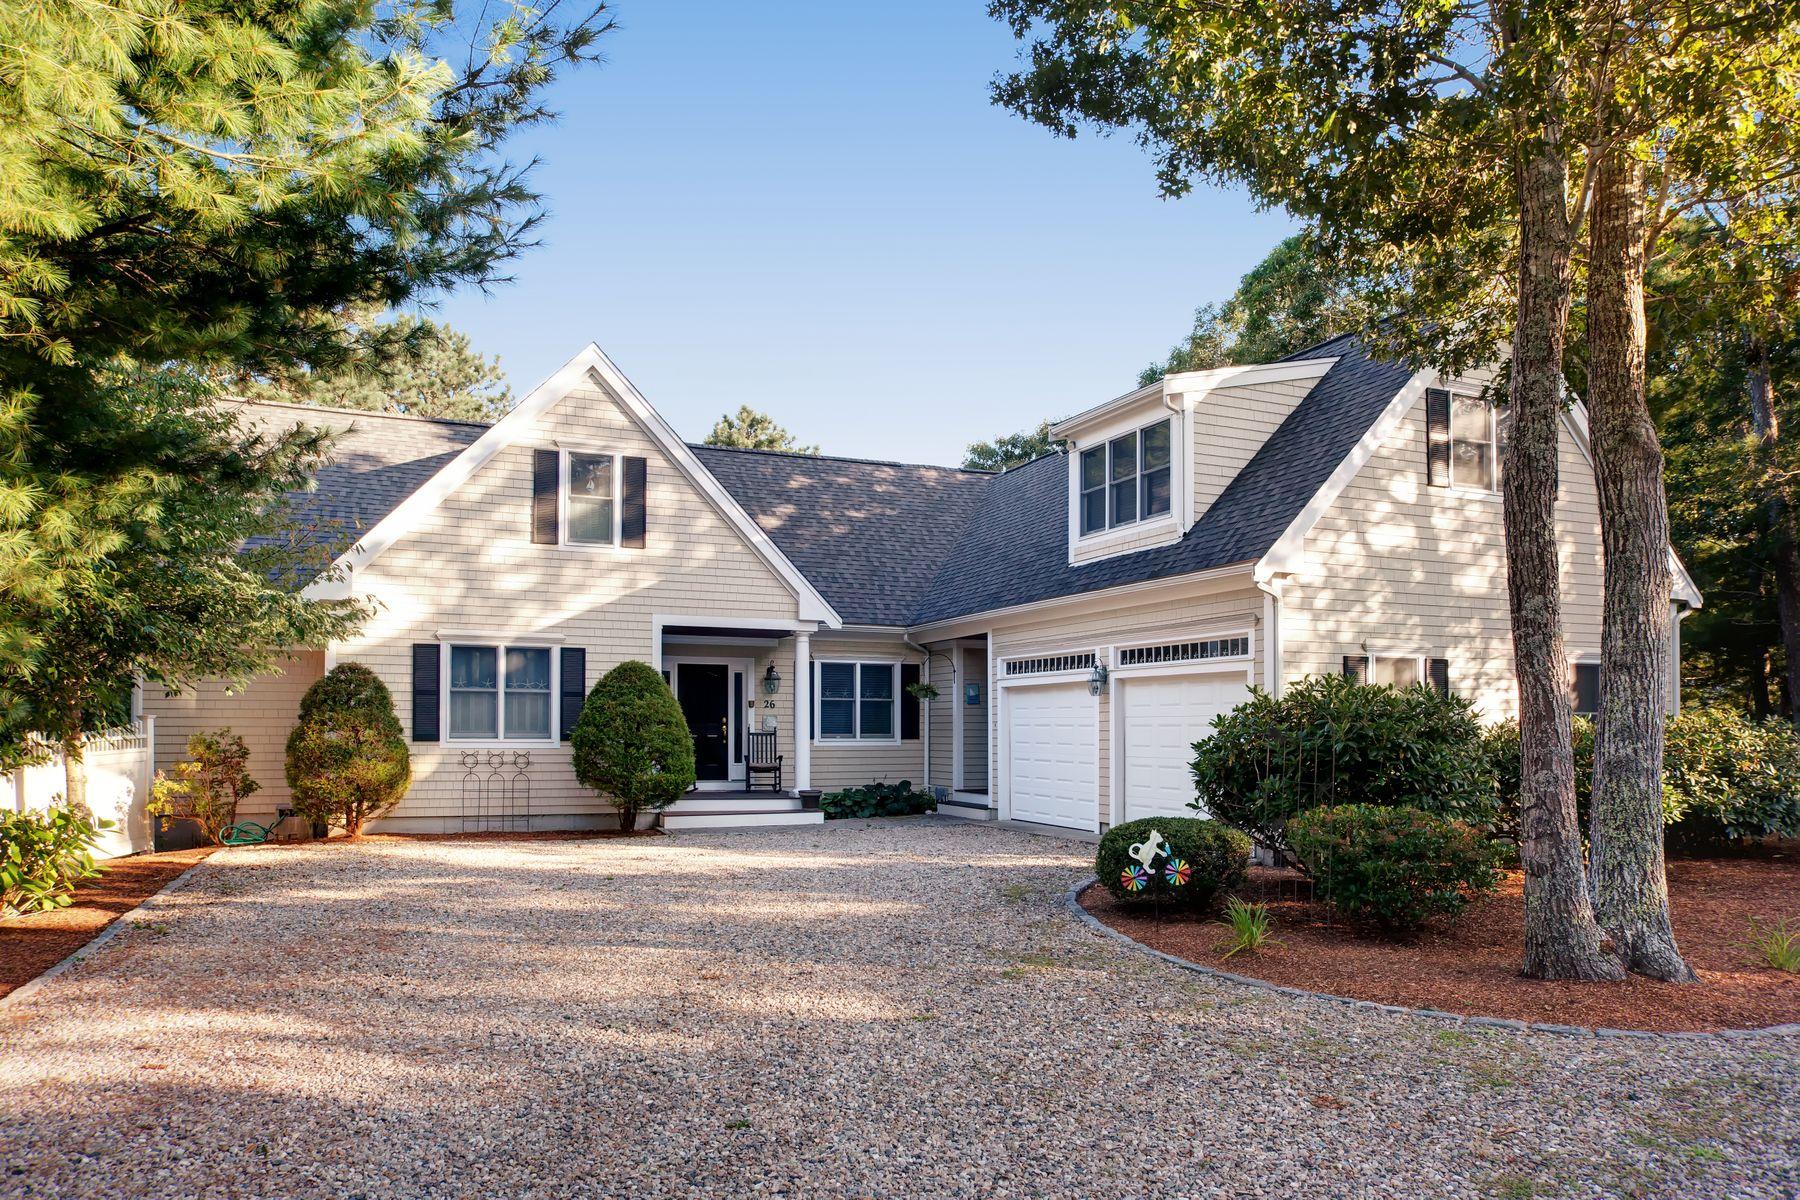 Single Family Homes 为 销售 在 26 Quaker Run Road, Mashpee, MA 26 Quaker Run Road 马什皮, 马萨诸塞州 02649 美国